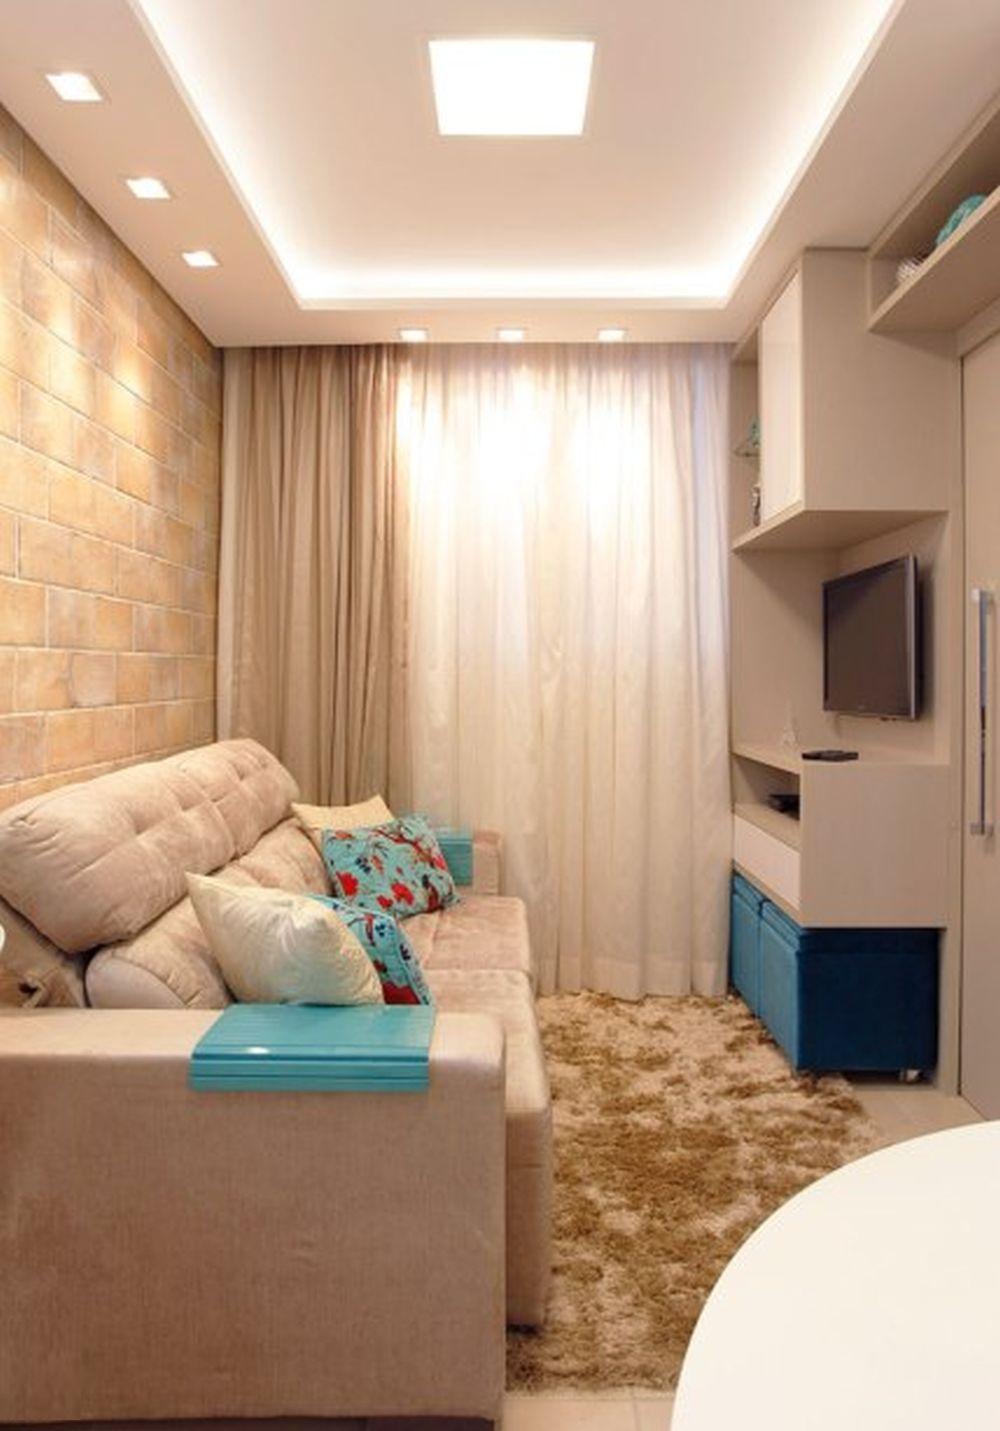 adelaparvu.com despre apartament 37 mp cu 2 dormitoare, Brazilia, design Only Design de Interiores, Foto Jefferson Ohara (7)